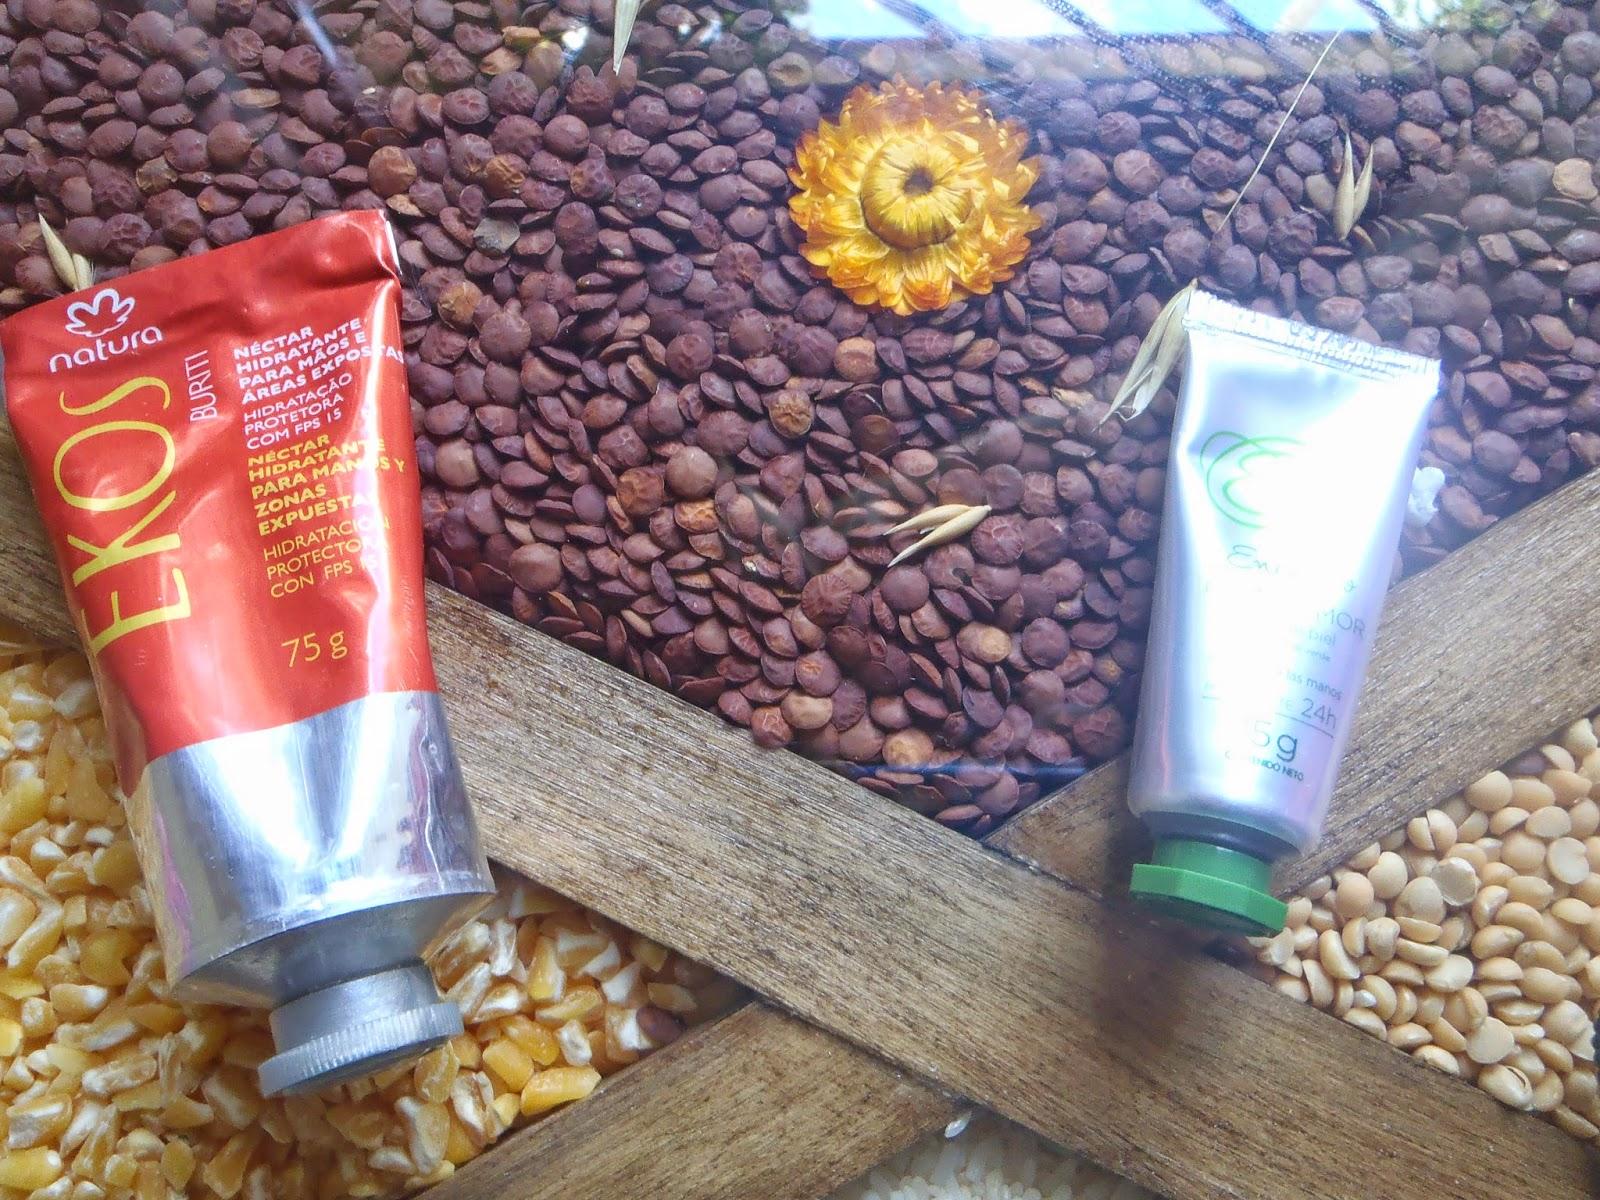 Crema de manos: Natura vs. Avon